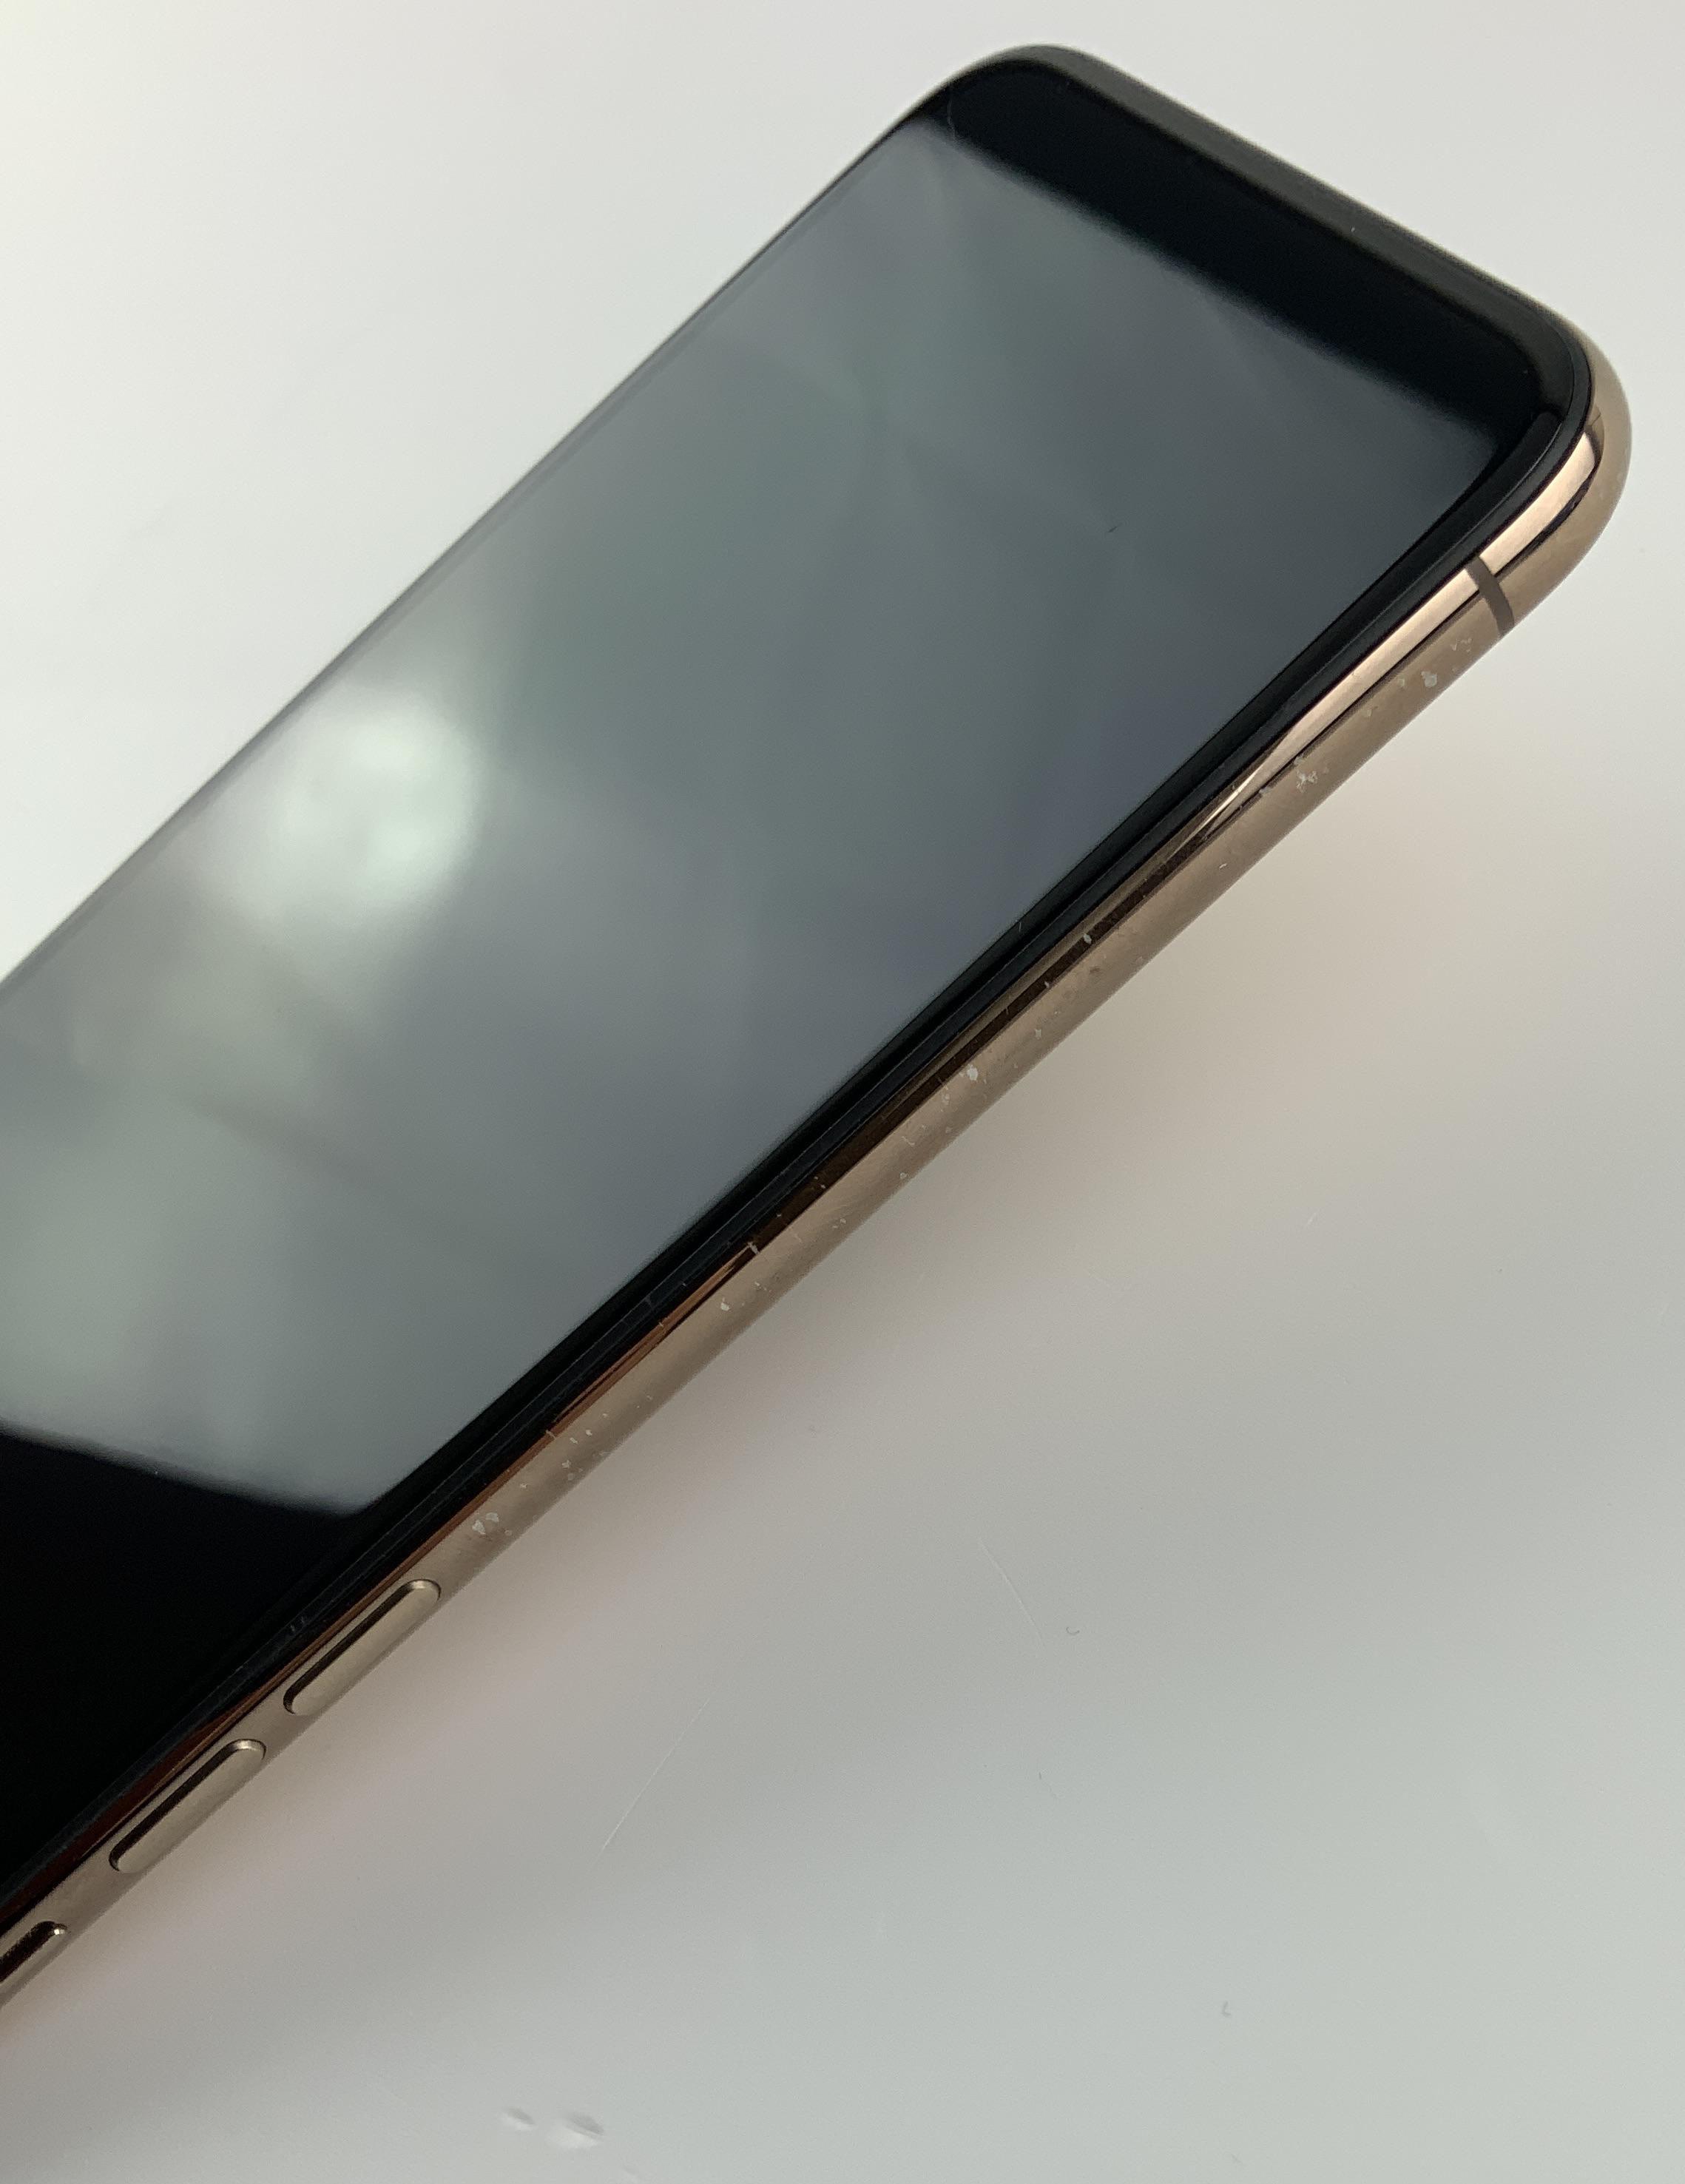 iPhone XS 256GB, 256GB, Gold, Afbeelding 3